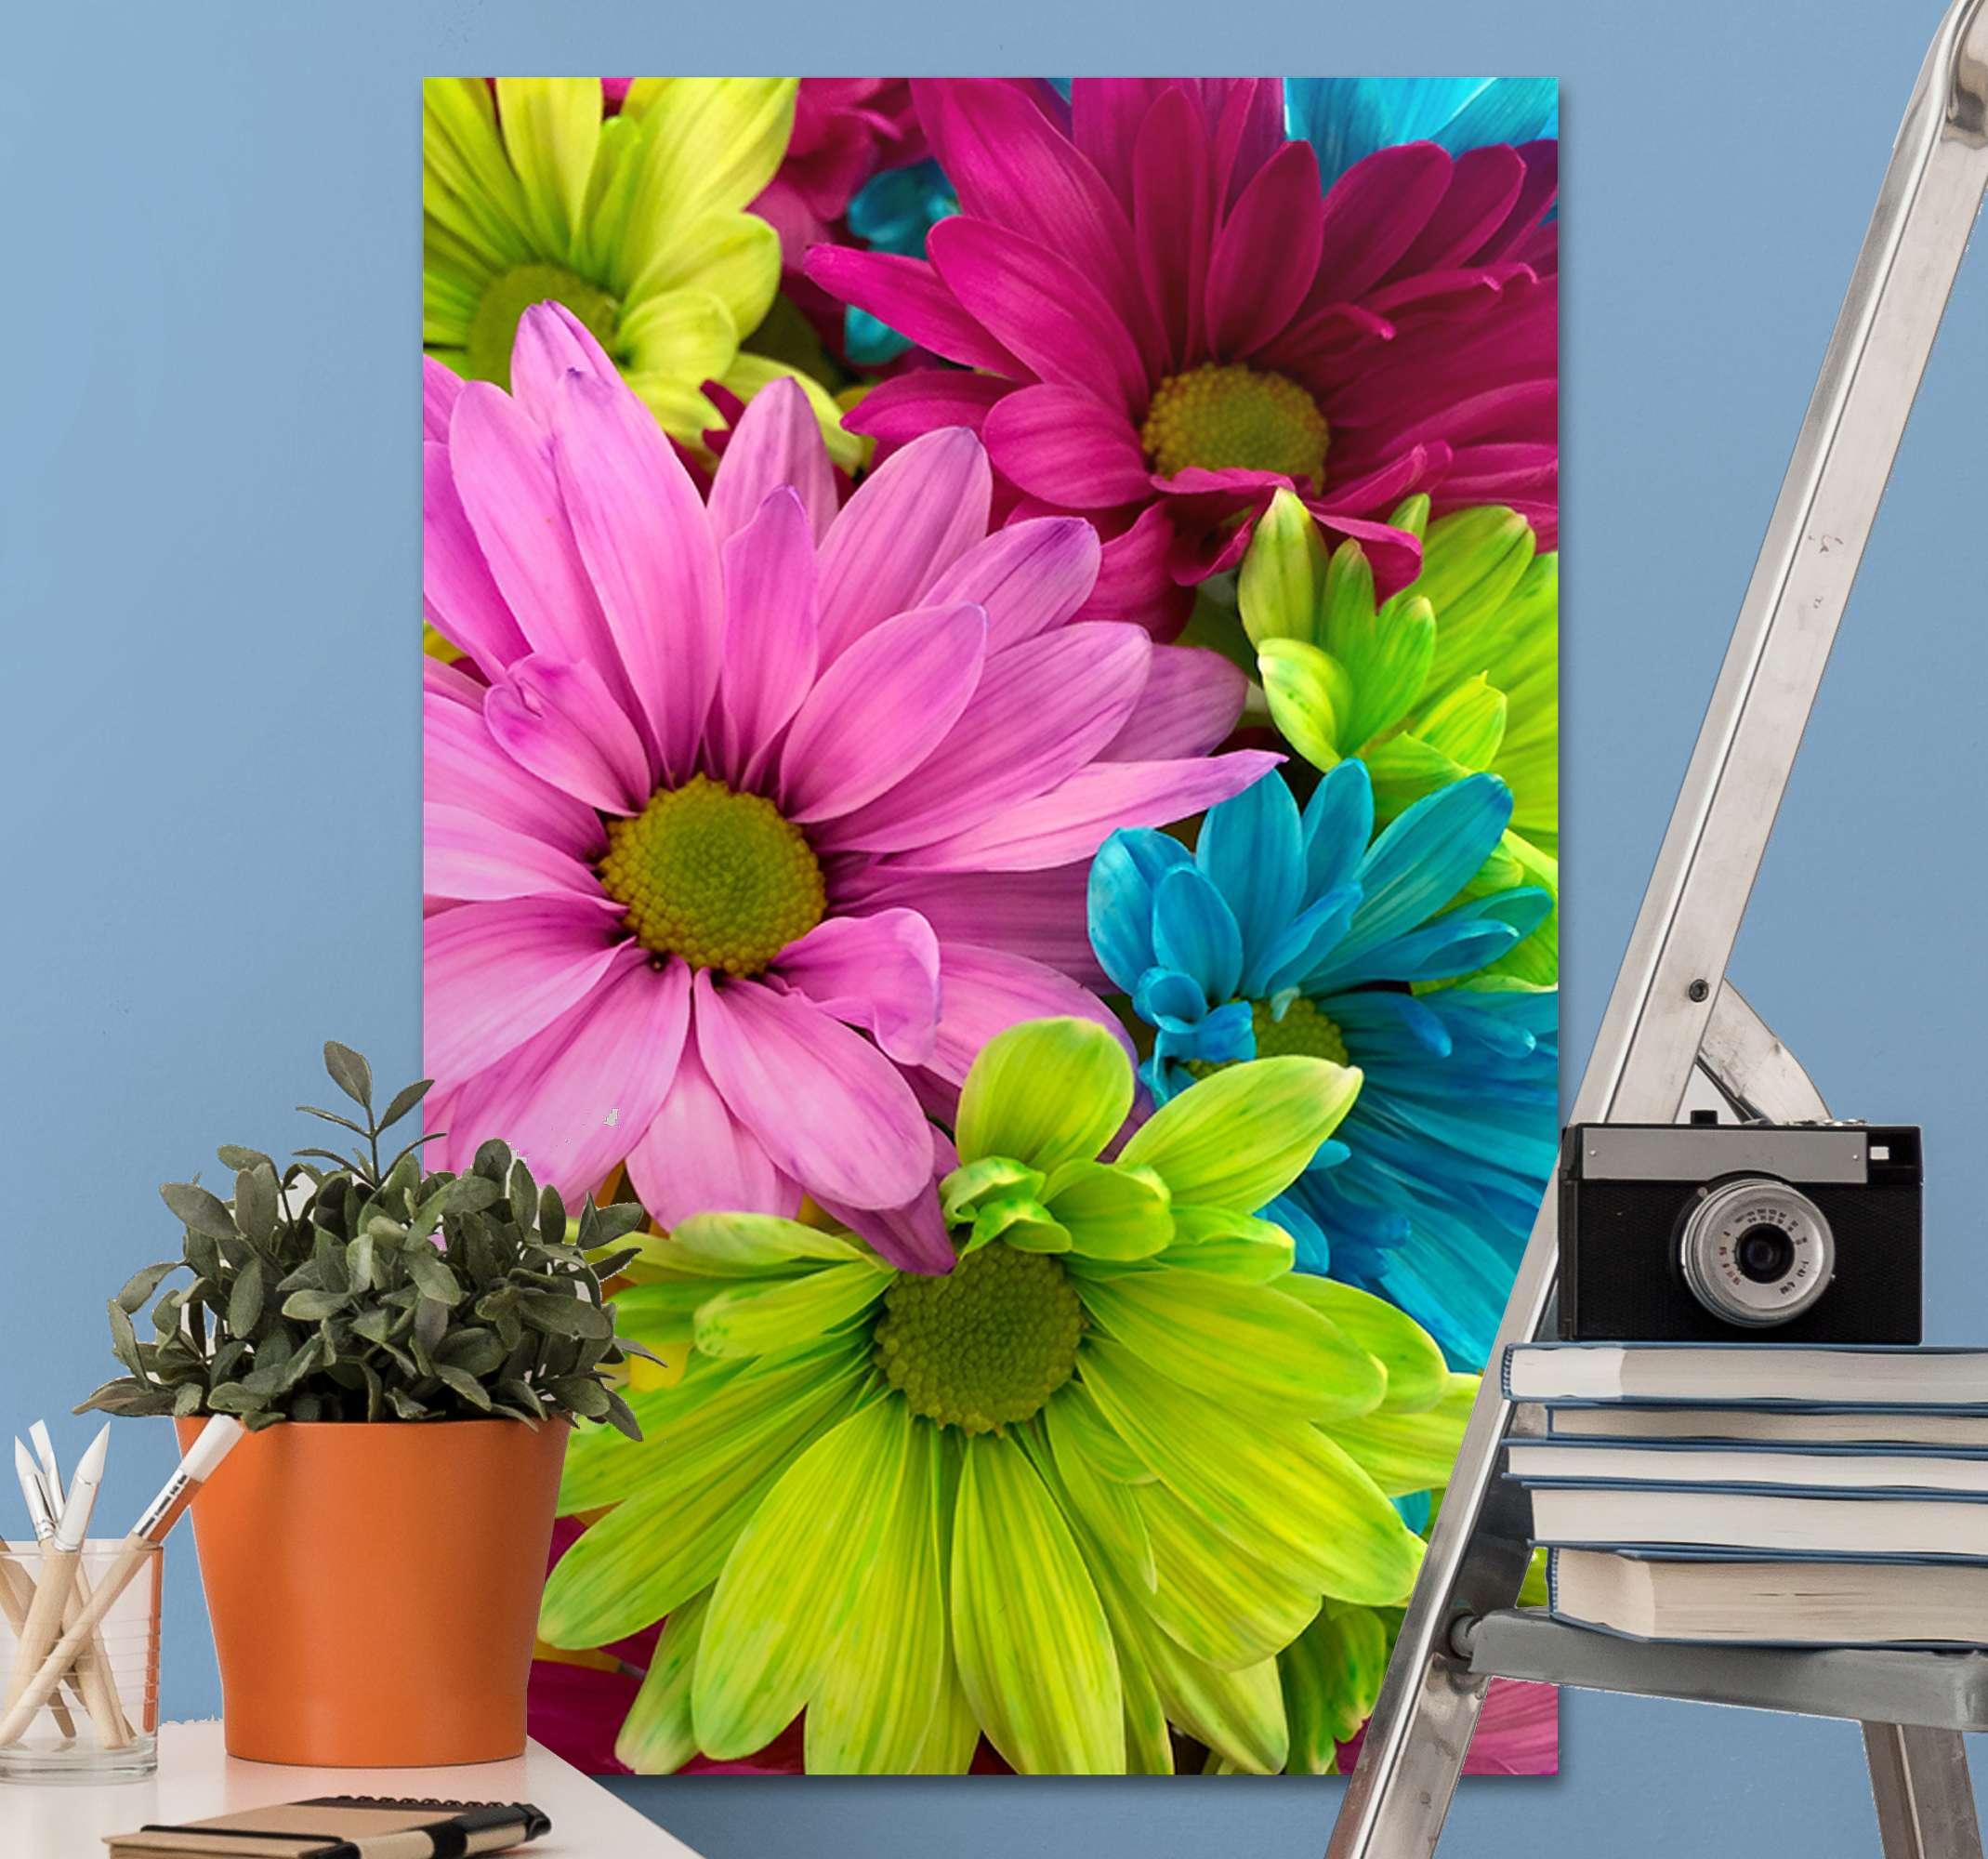 TenStickers. 七彩花朵画布. 使用我们色彩艳丽的花墙艺术画布,您将以原始和现代的方式装饰房屋。容易挂在墙上,很轻。